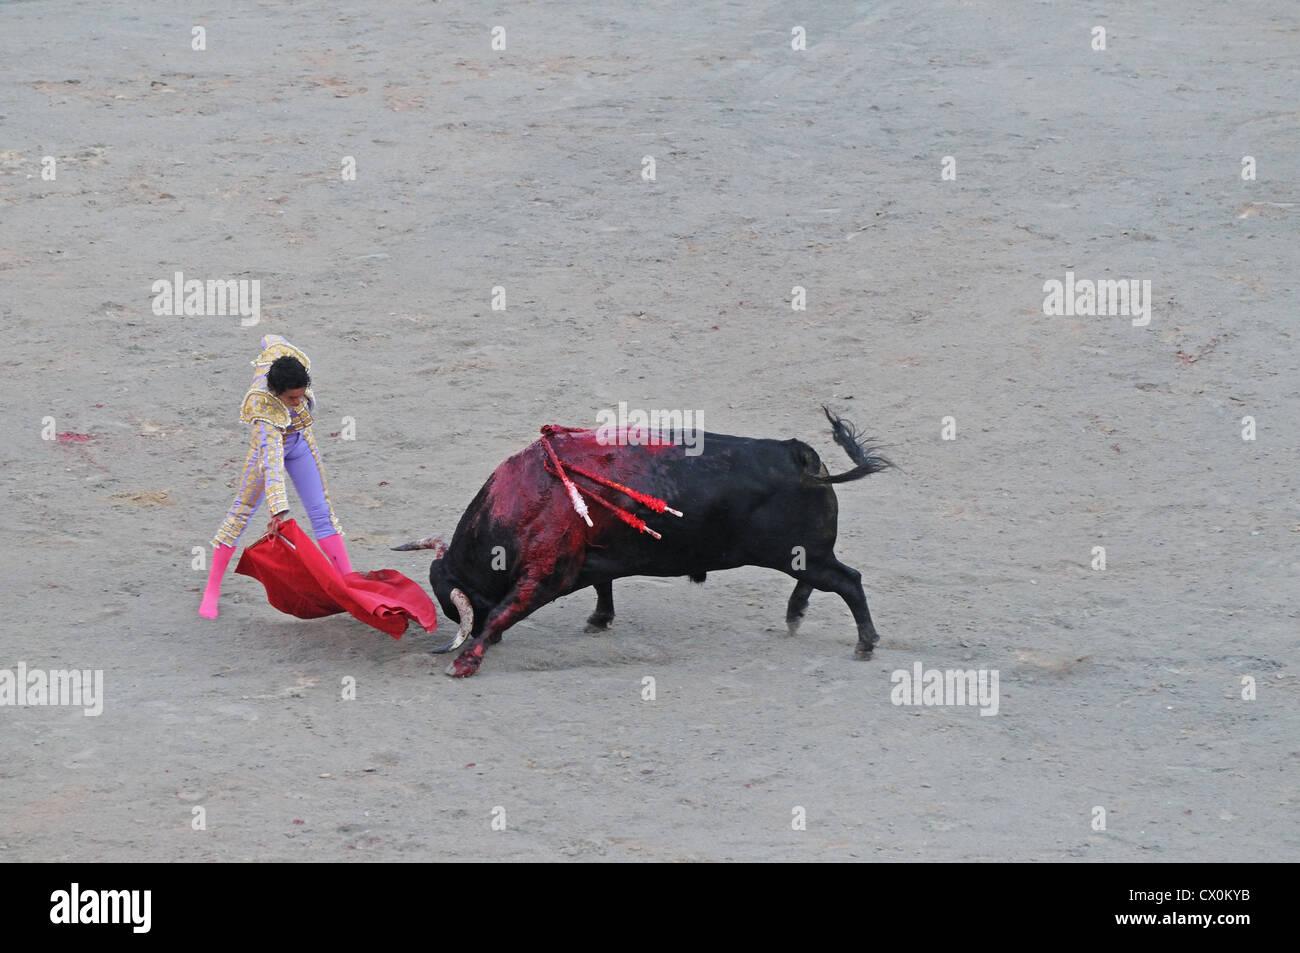 Bulls Kopf prakts unten